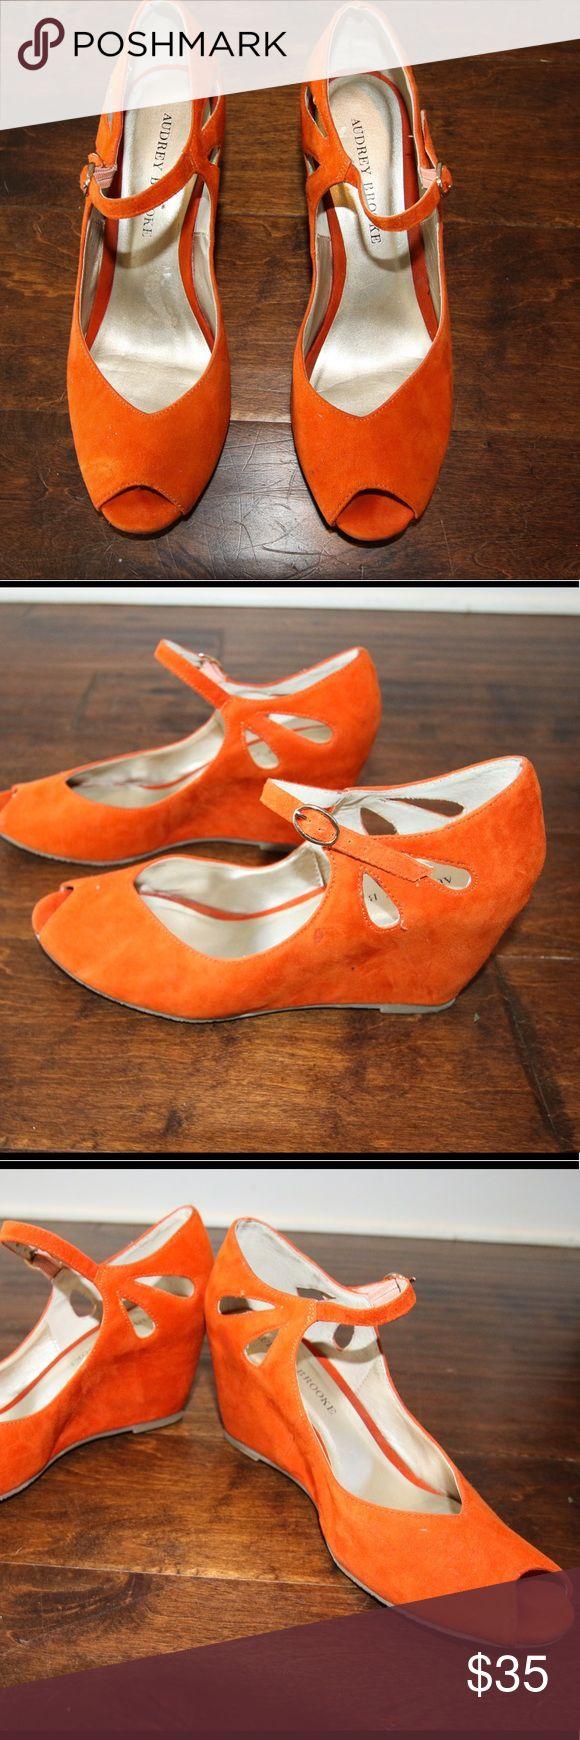 Audrey Brooke  orange suede wedge sz 8 Audrey Brooke orange suede wedges  sz 8 Audrey Brooke Shoes Wedges